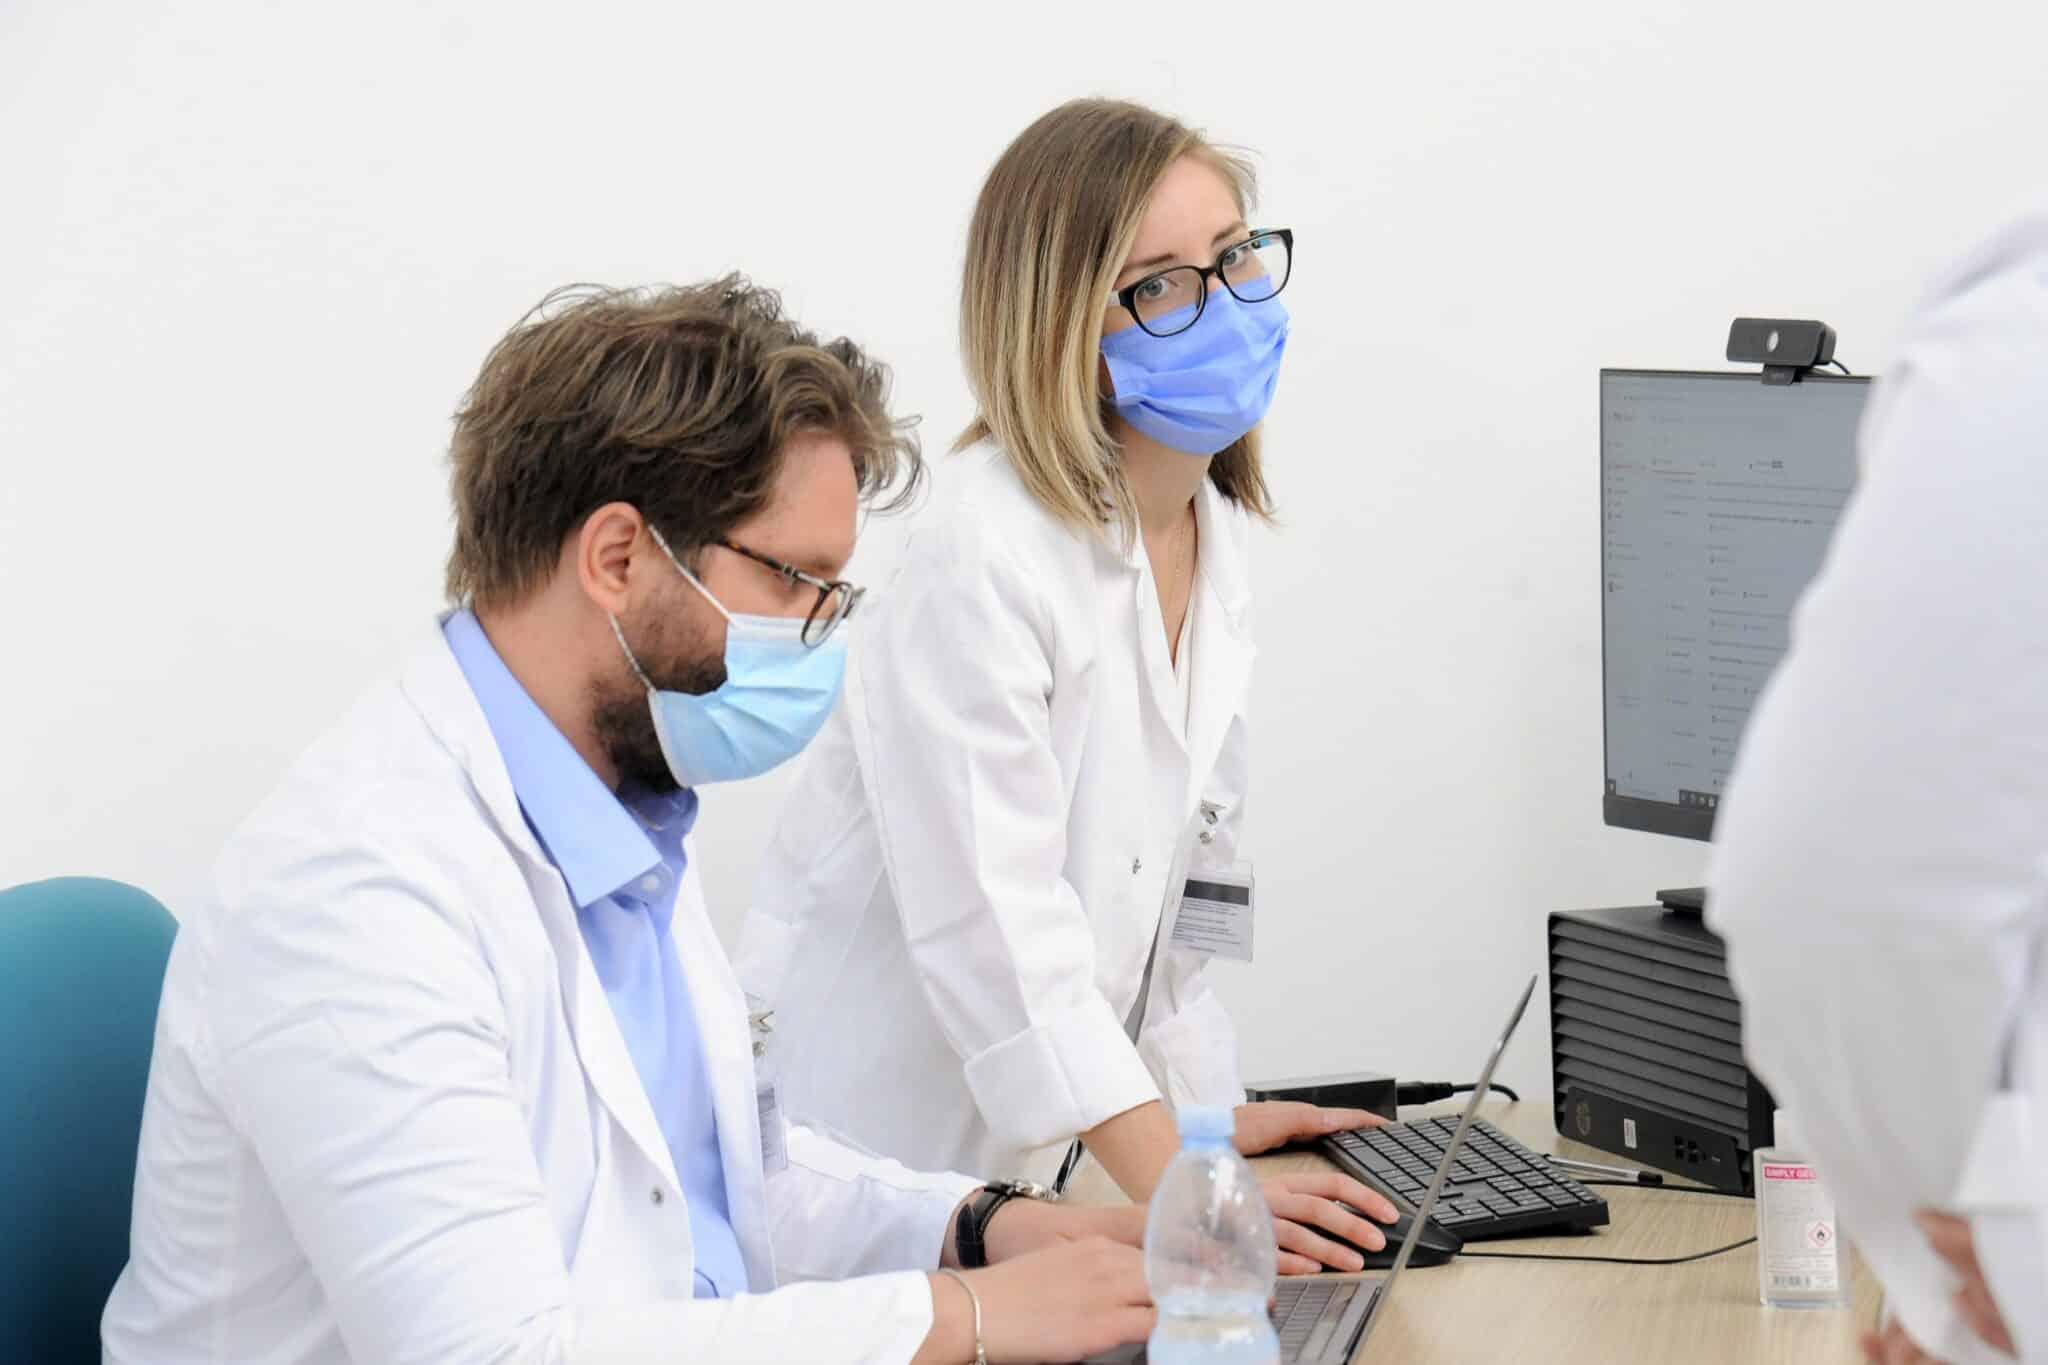 Operatori sanitari no vax, al via prime sospensioni dal lavoro